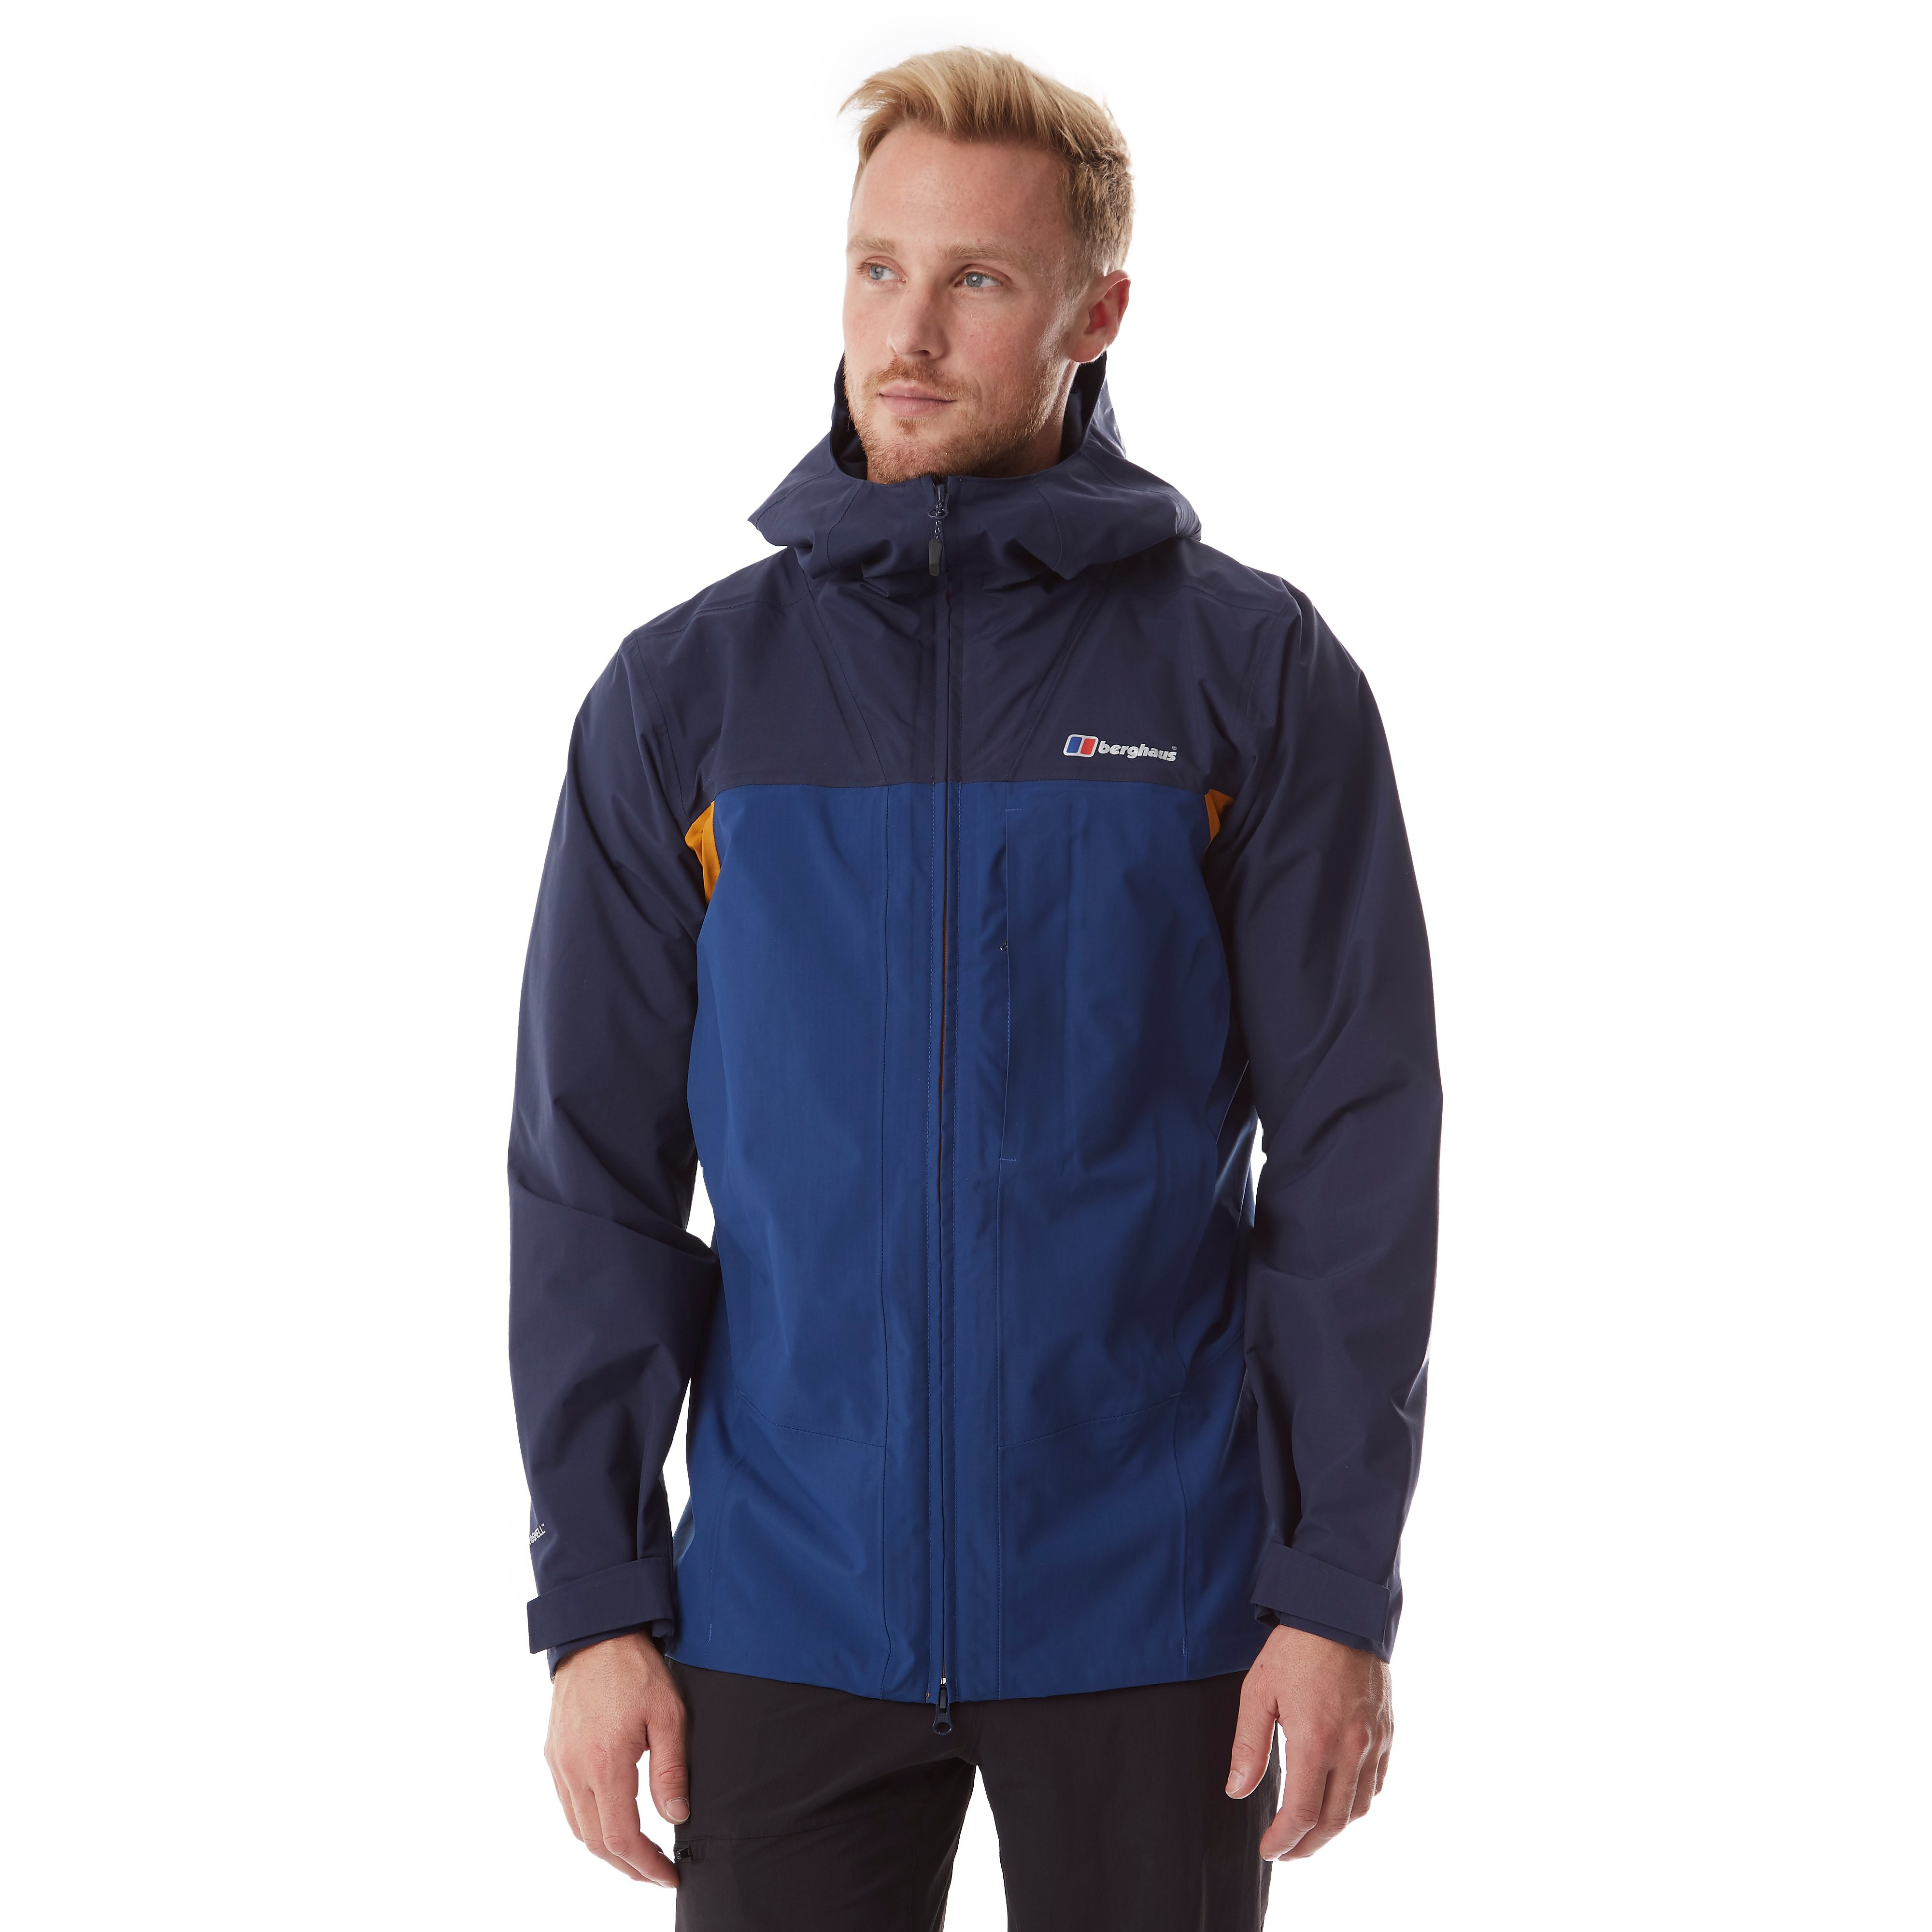 672ce58ef Berghaus Chombu Jacket – Men's | Jacket Compare – Compare outdoor ...